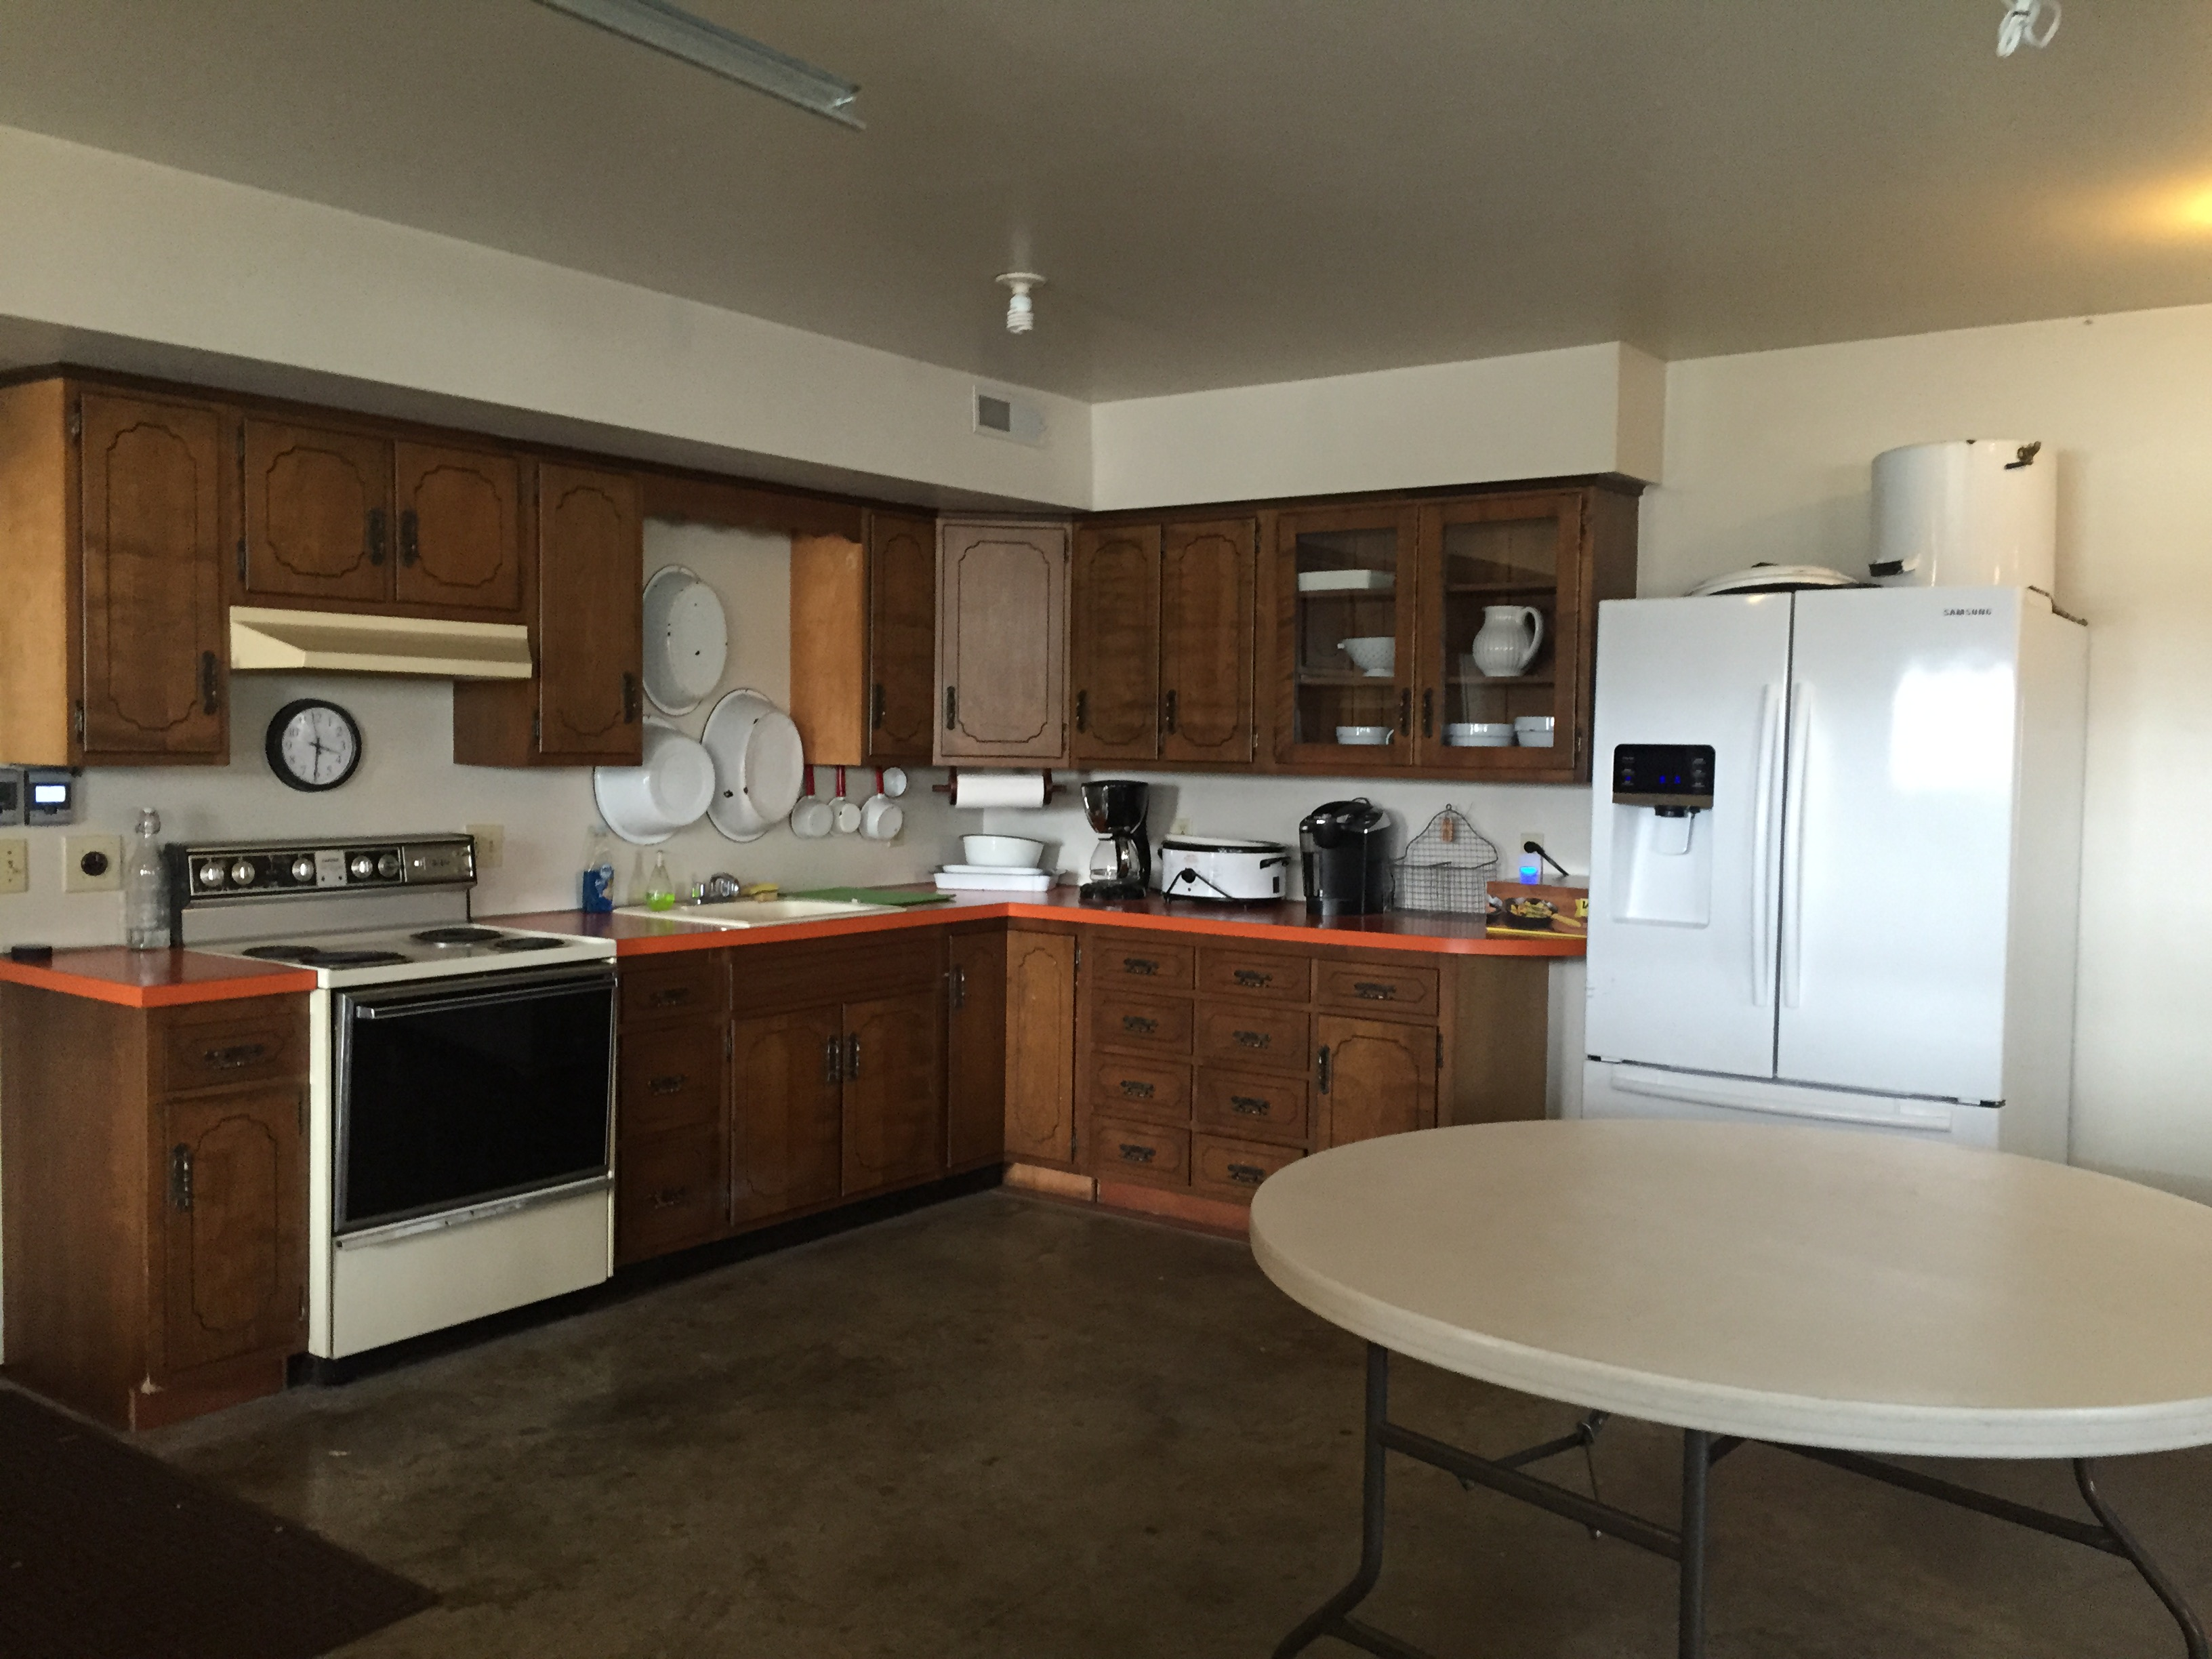 Garage kitchen cambridge meadows guest house for Kitchen units in garage